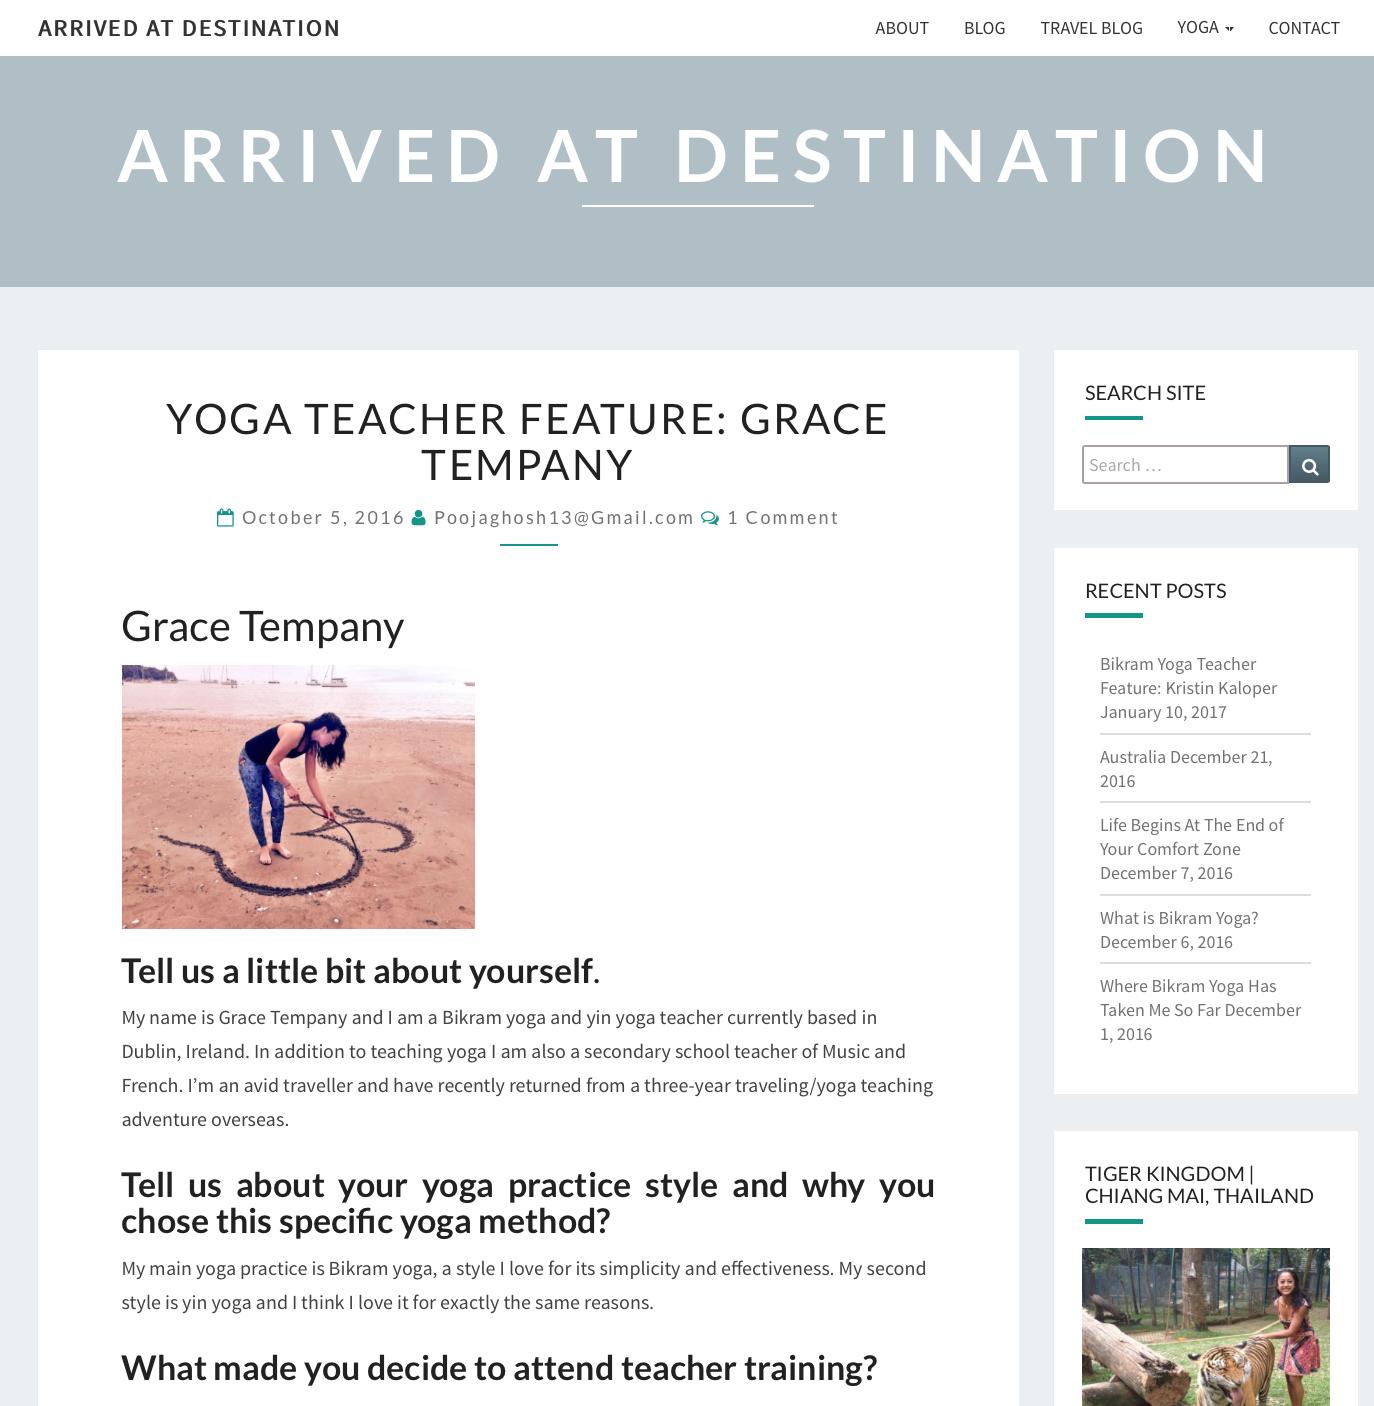 Arrived at Destination - Featured Yoga Teacher